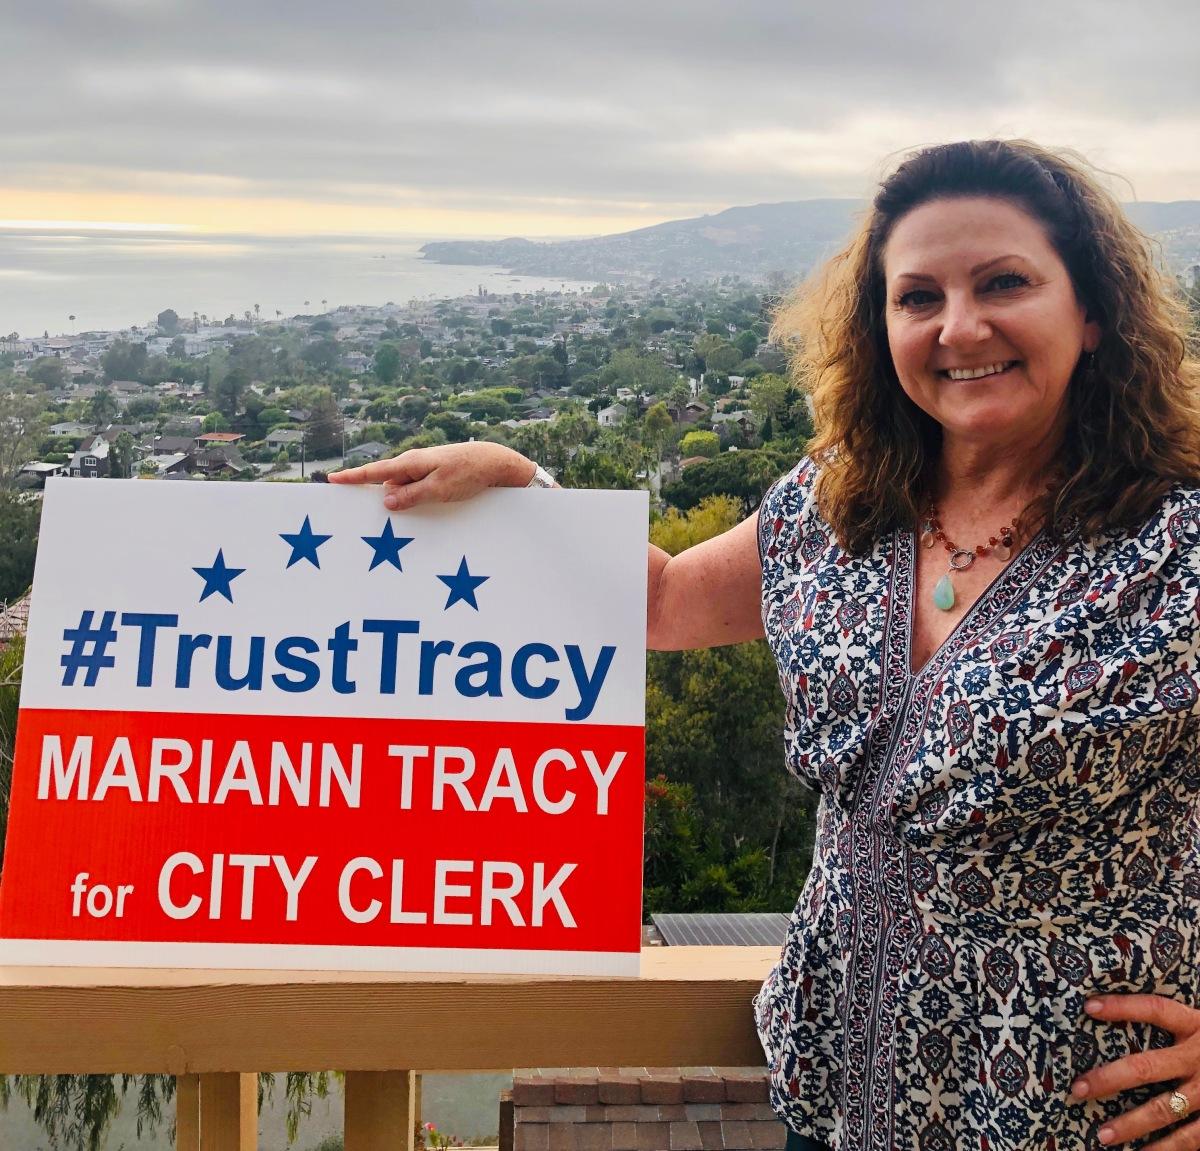 Mariann Tracy for City Clerk